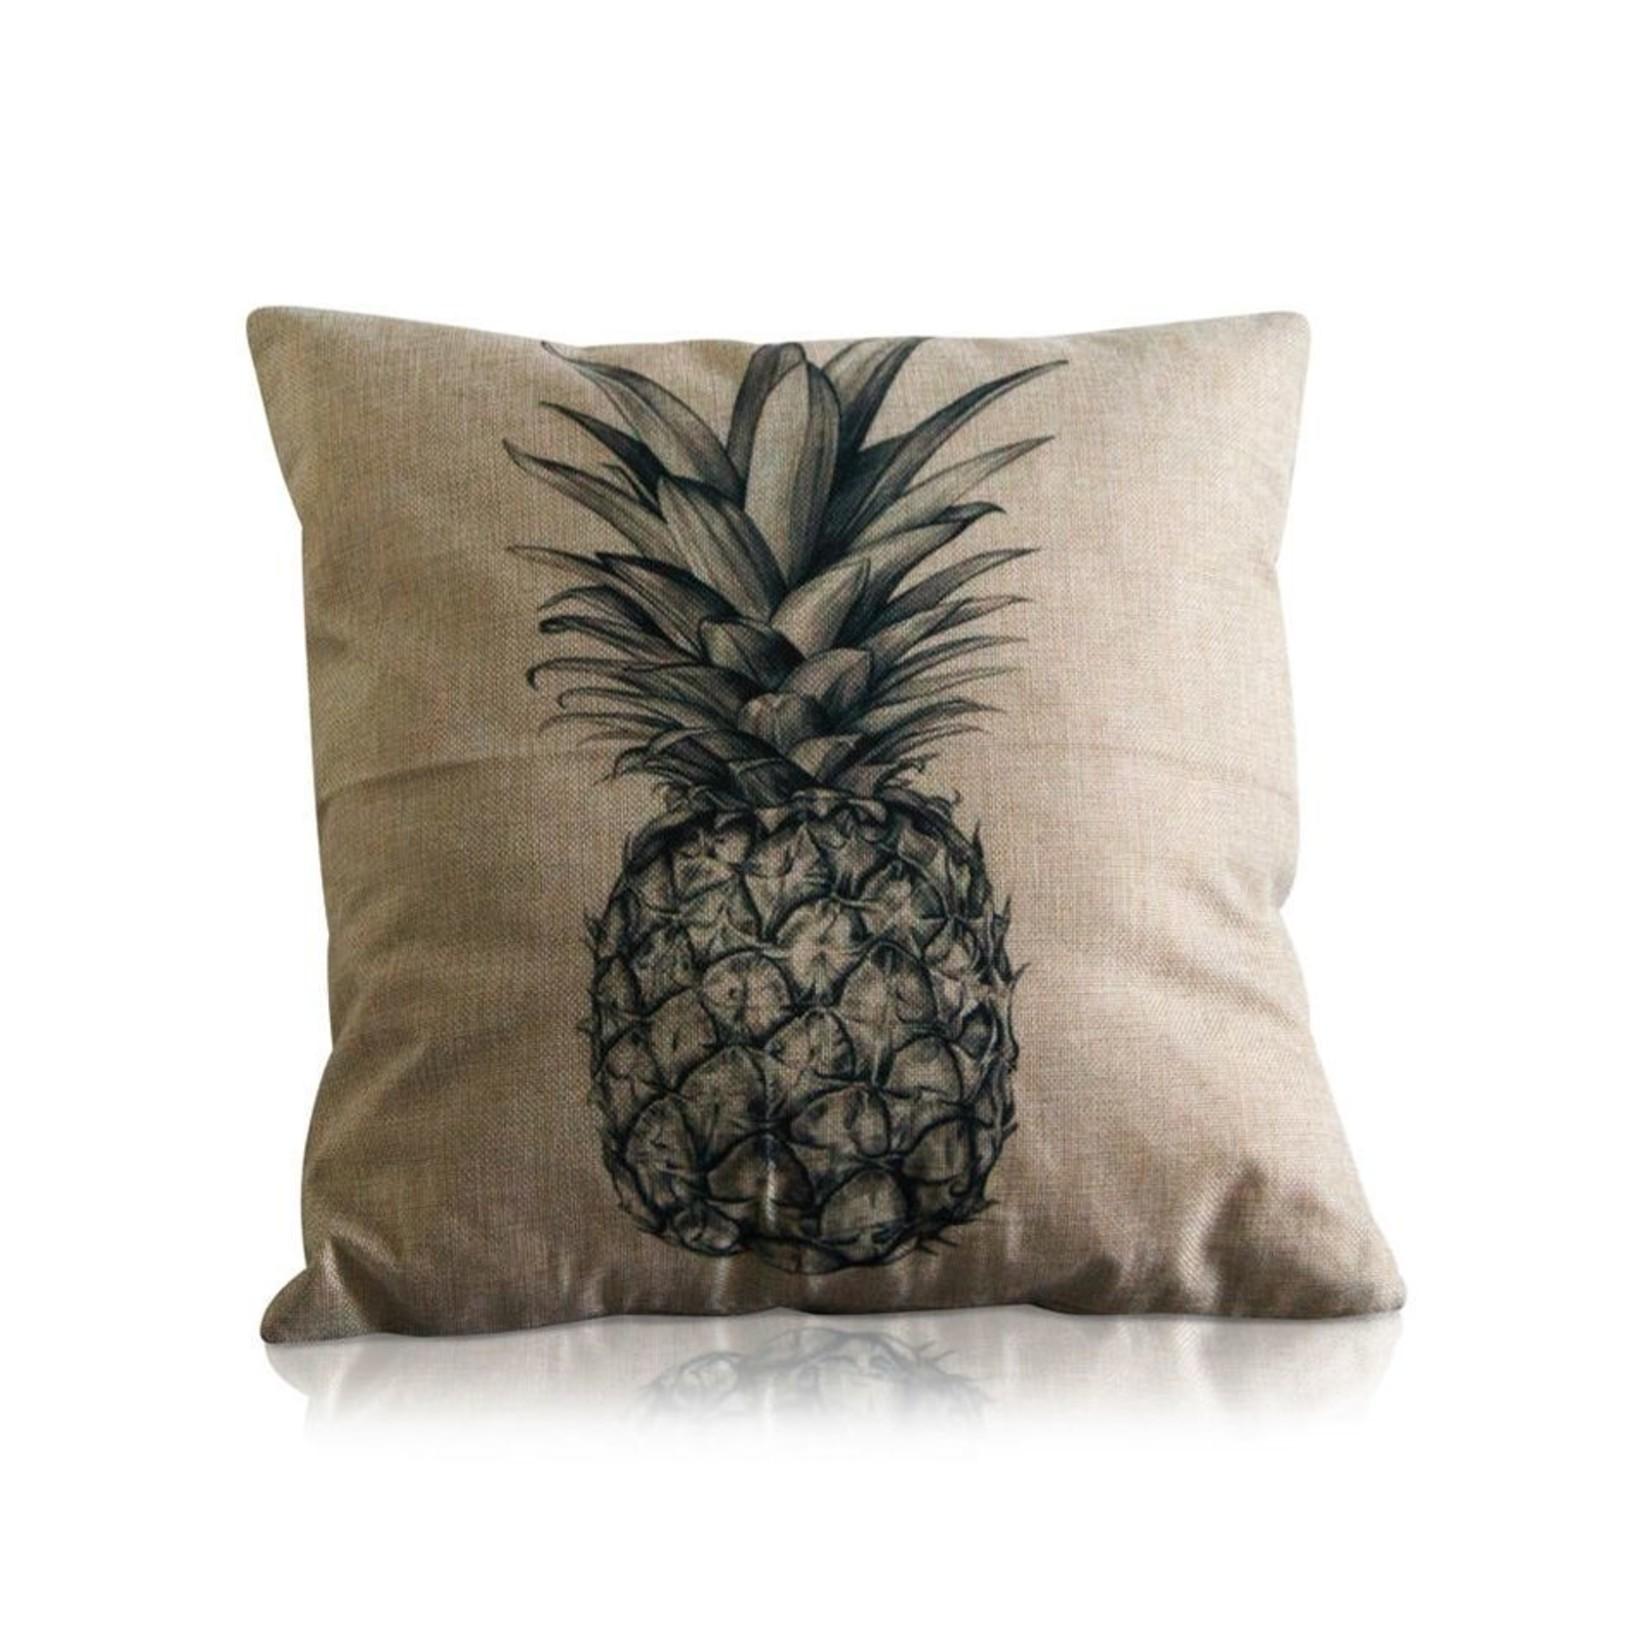 I Love My Interior I Love My Interior kussenhoes ananas